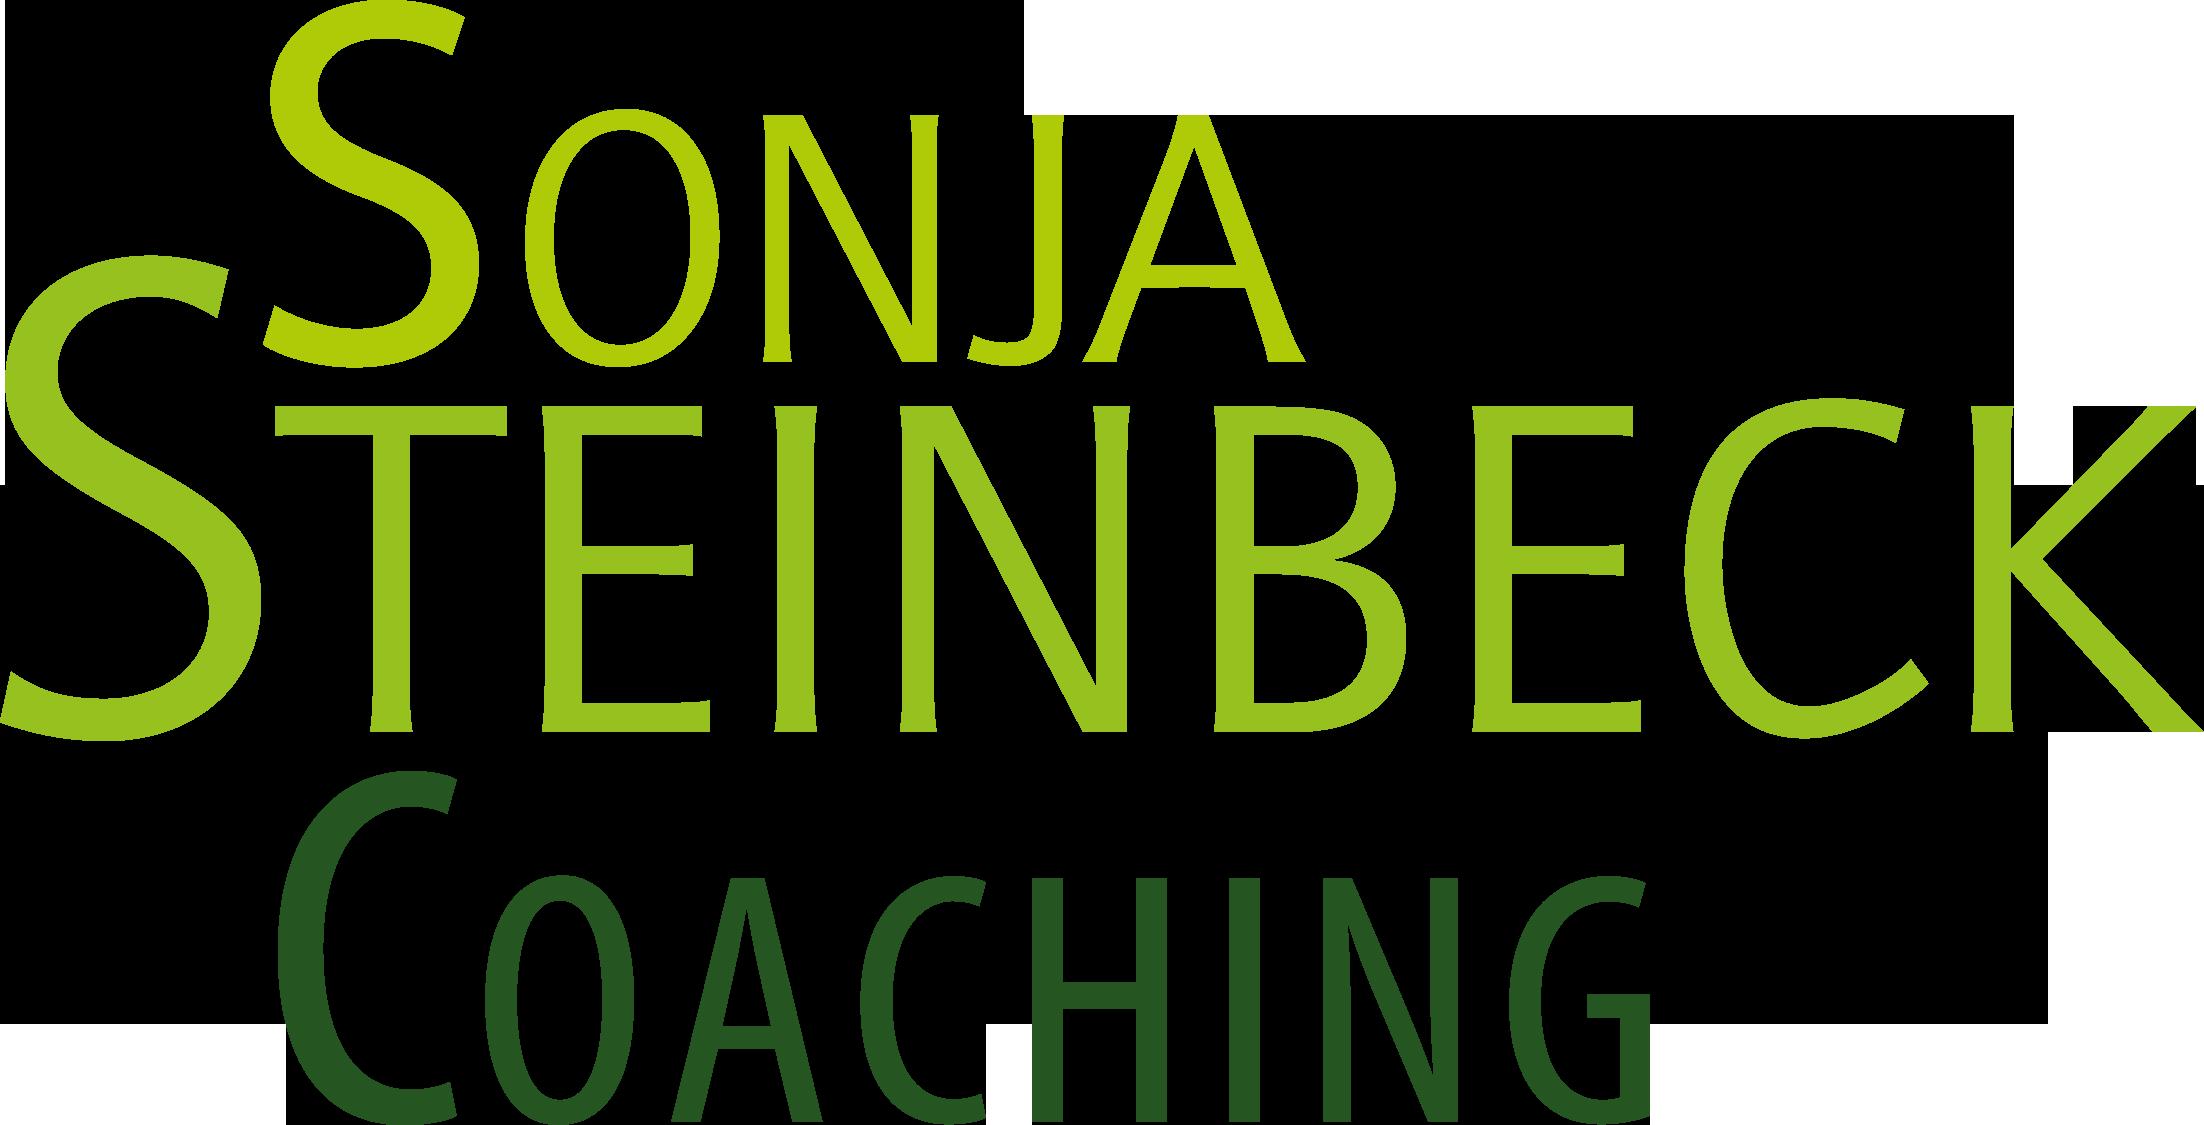 Sonja Steinbeck - Coaching